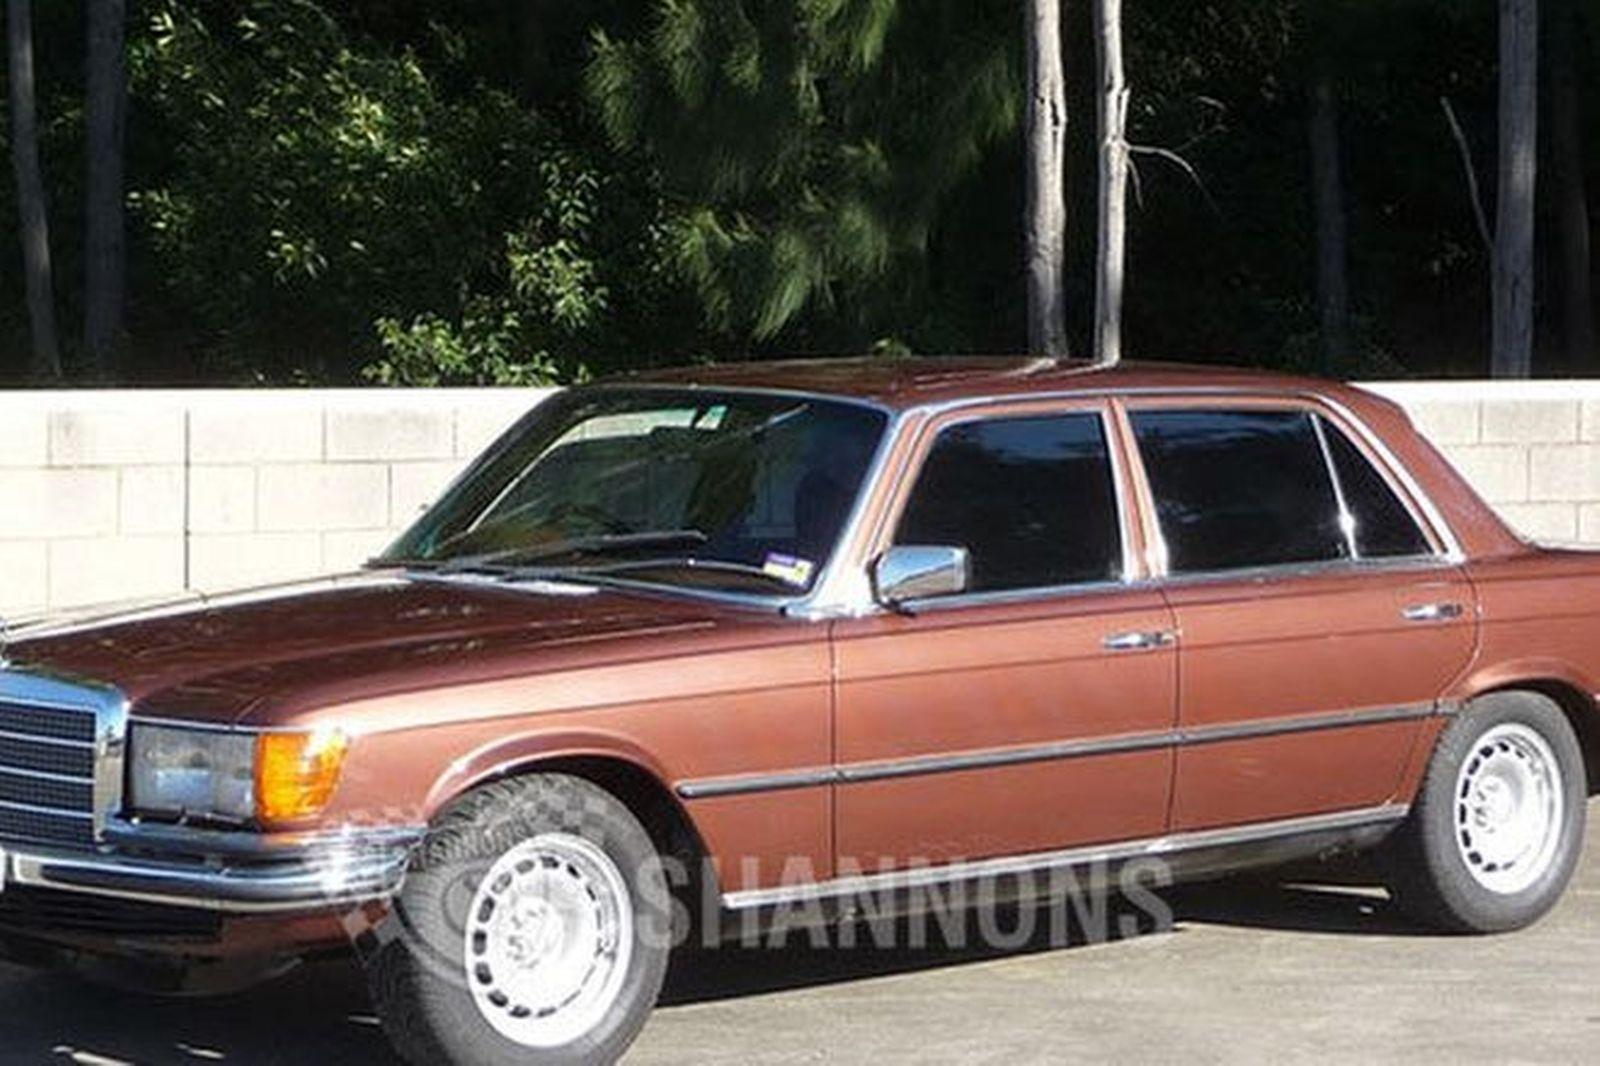 sold mercedes benz 450sel 6 9 sedan auctions lot 10 shannons. Black Bedroom Furniture Sets. Home Design Ideas